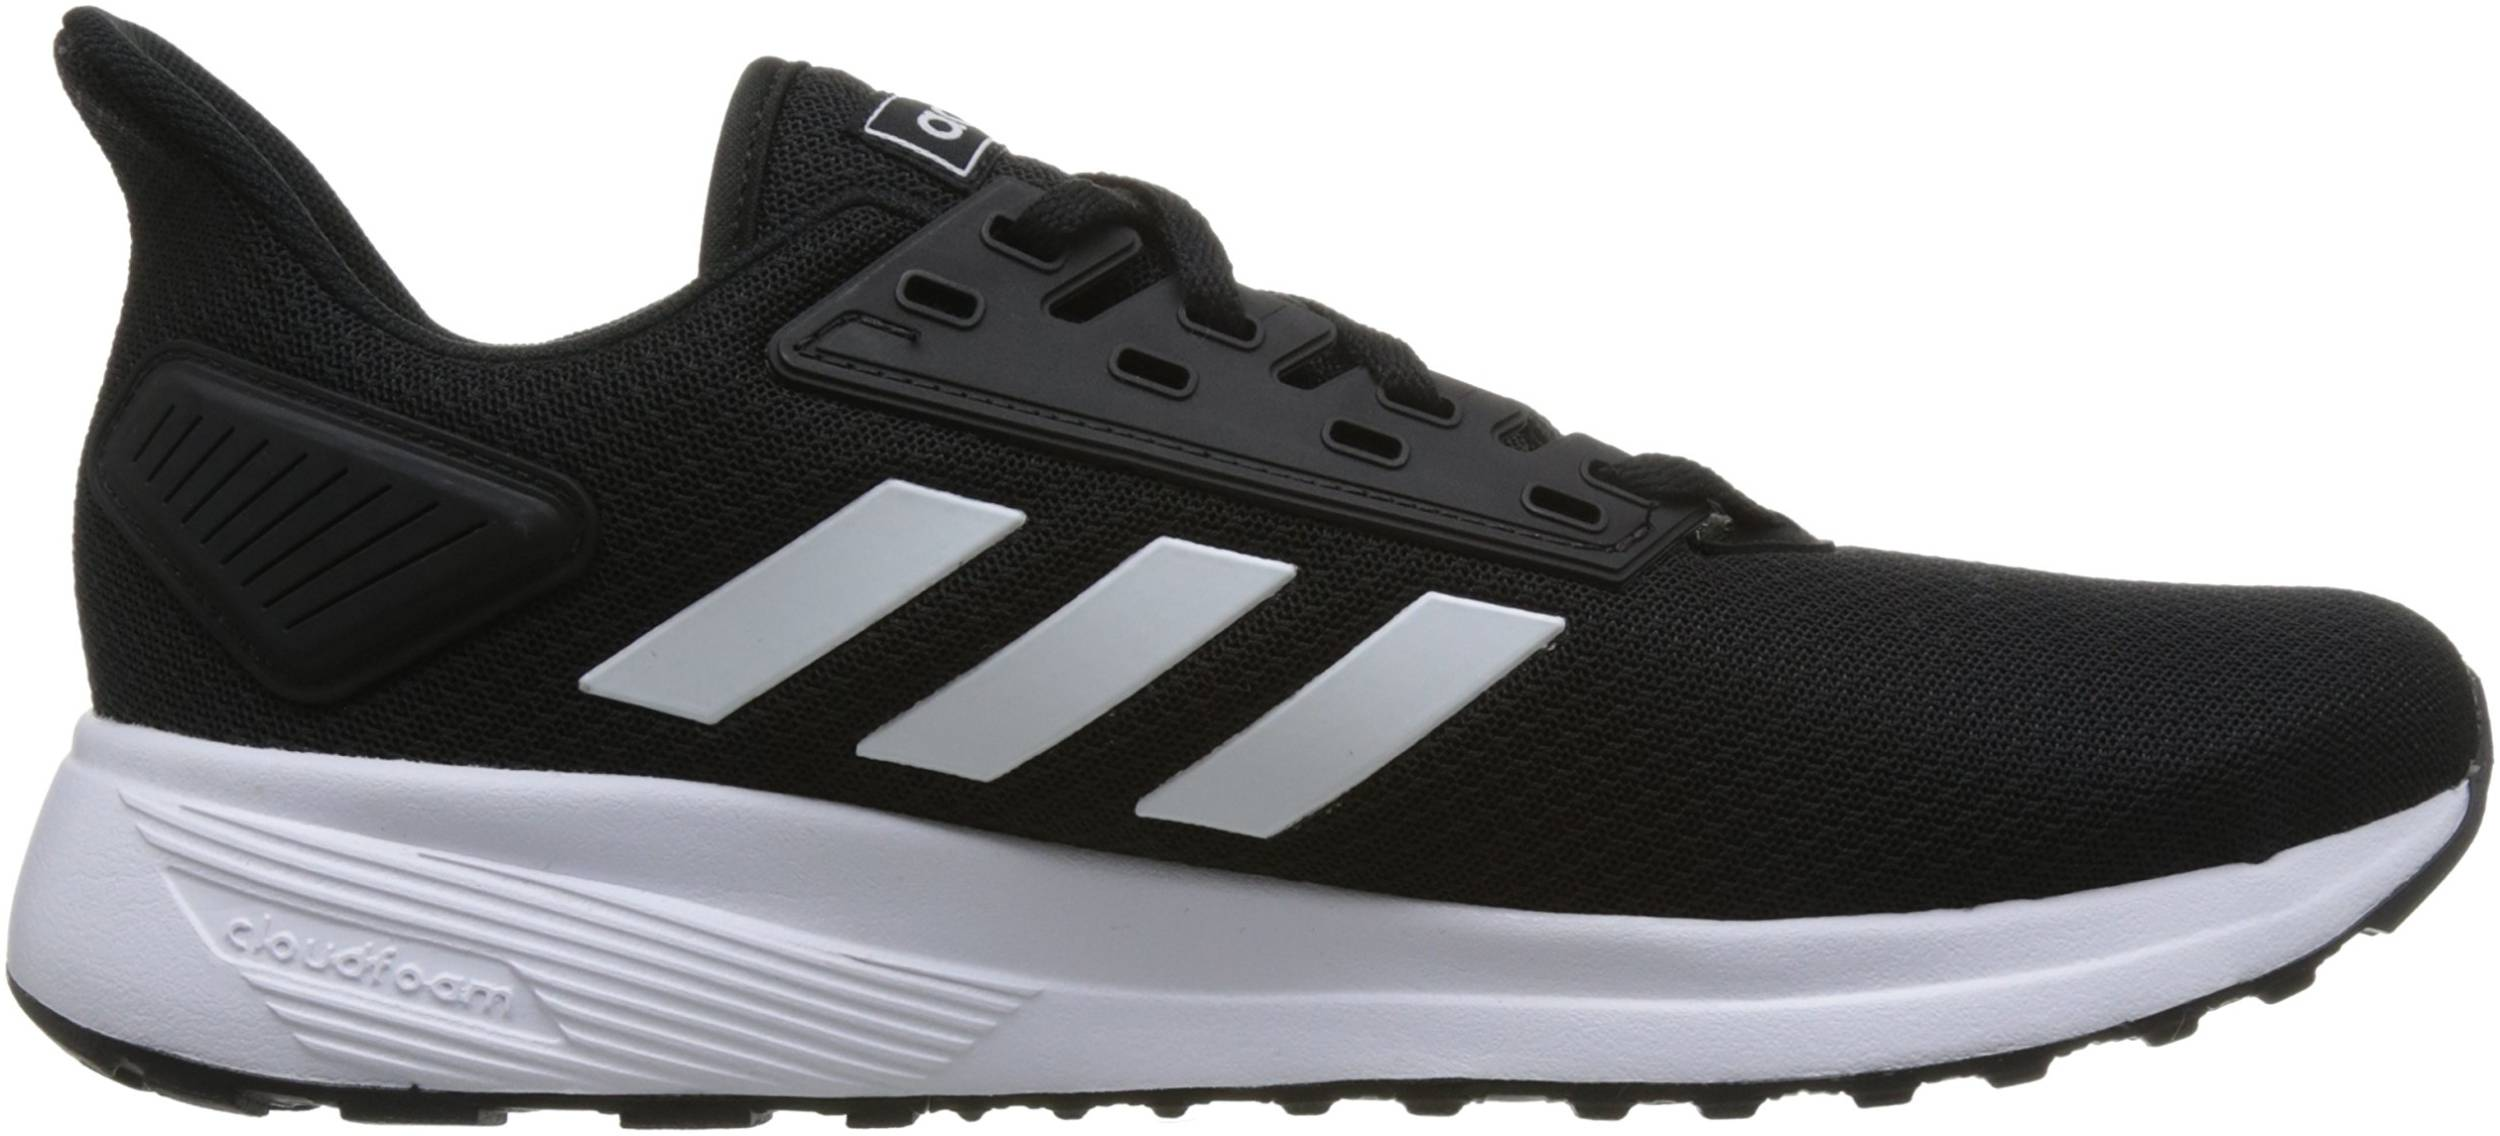 duramo running shoes